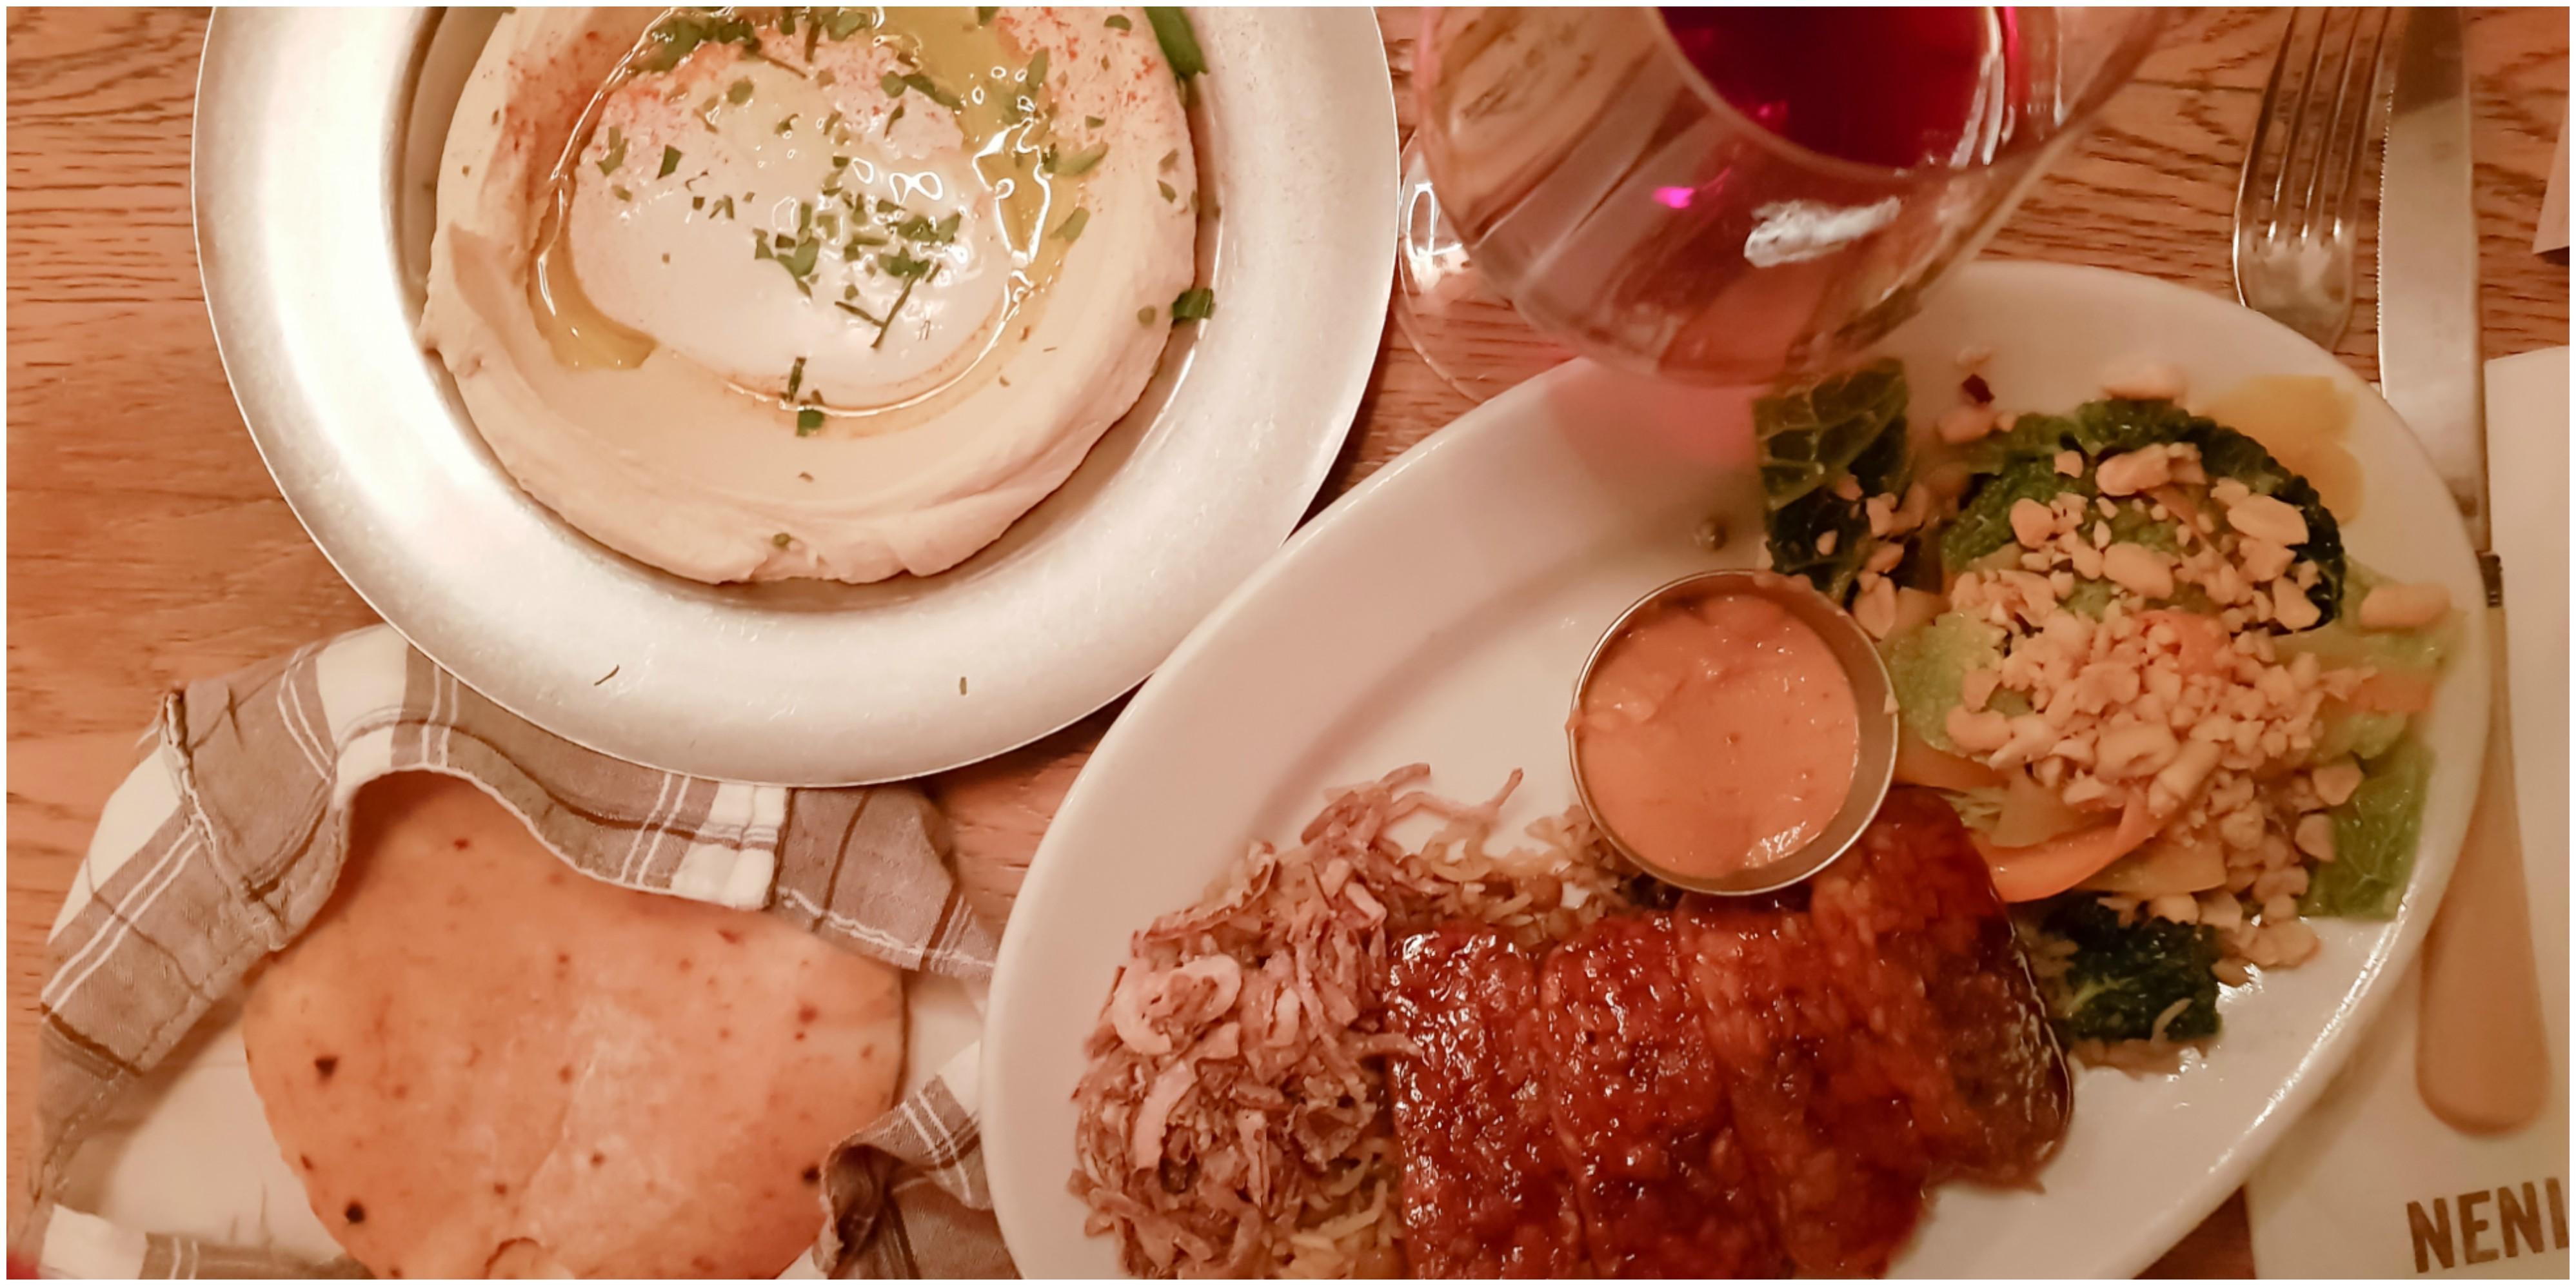 neni-wien-tel-aviv-cooking-vegan-friendly